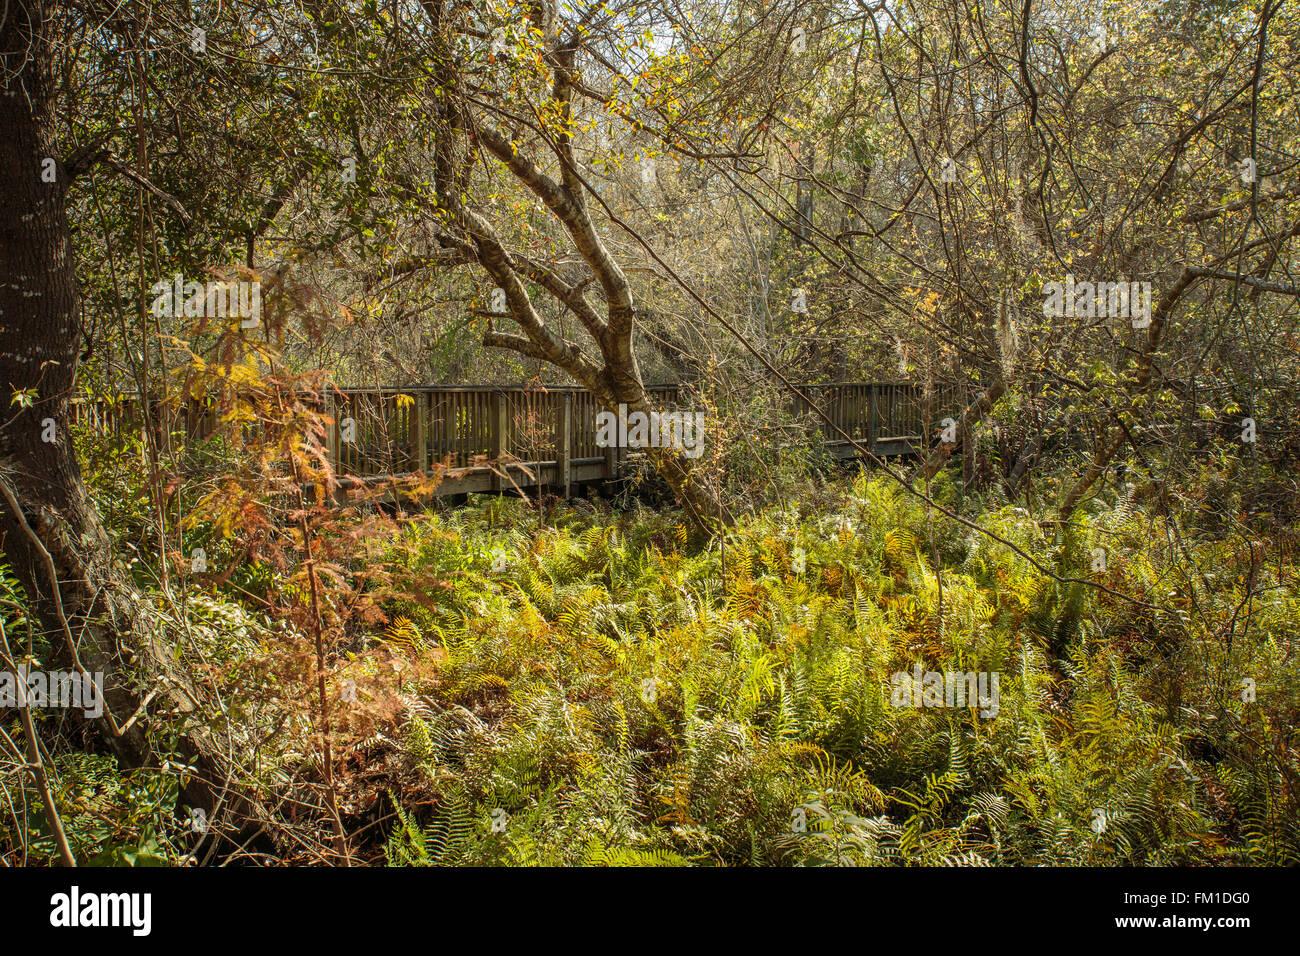 The boardwalk at Sawgrass Lake Park in St. Petersburg, Florida, USA - Stock Image